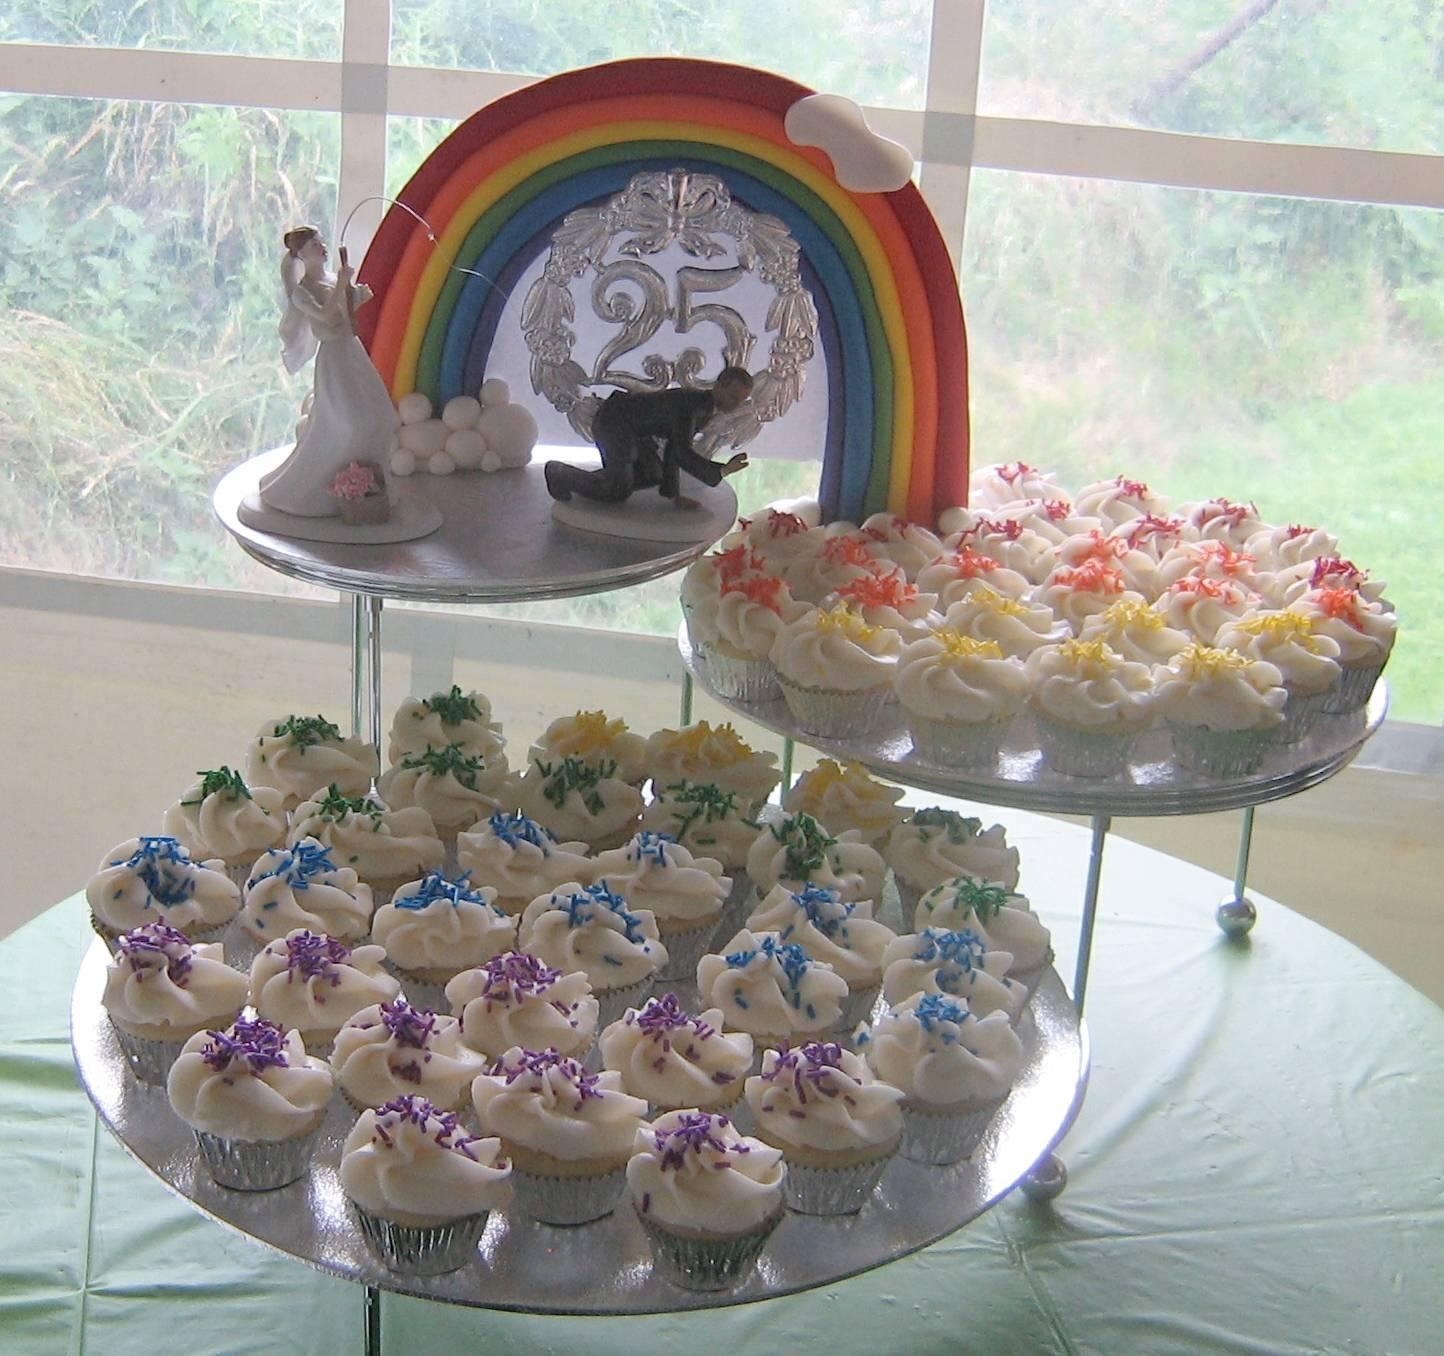 Rainbow Theme Cupcakes